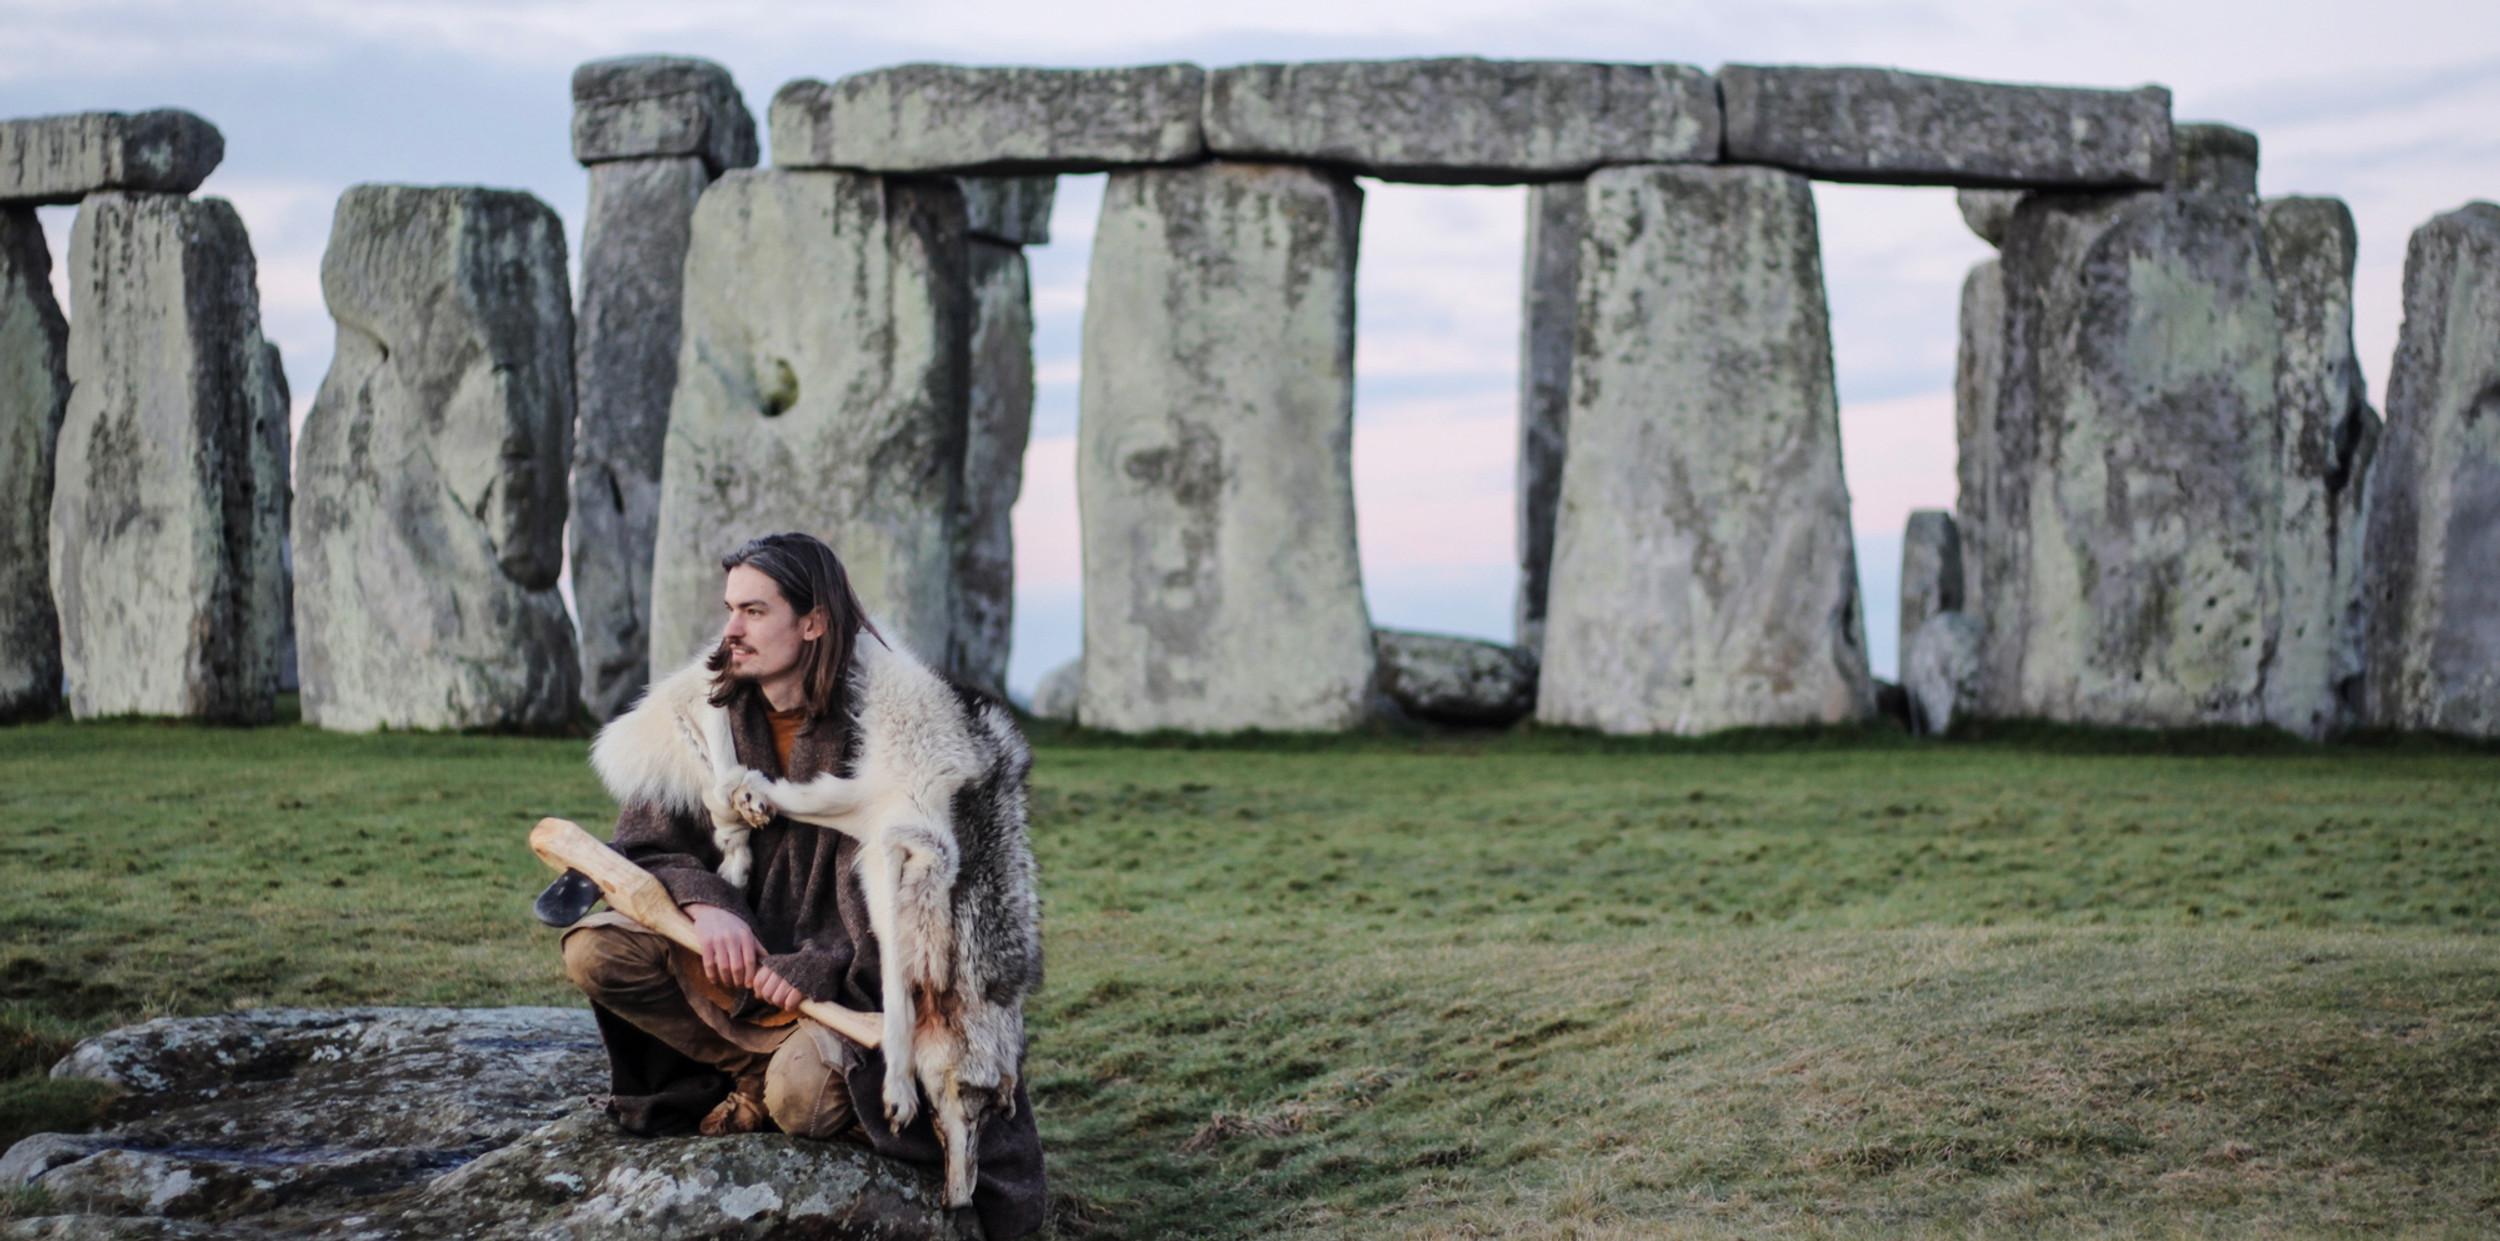 www.ancientcraft.co.uk